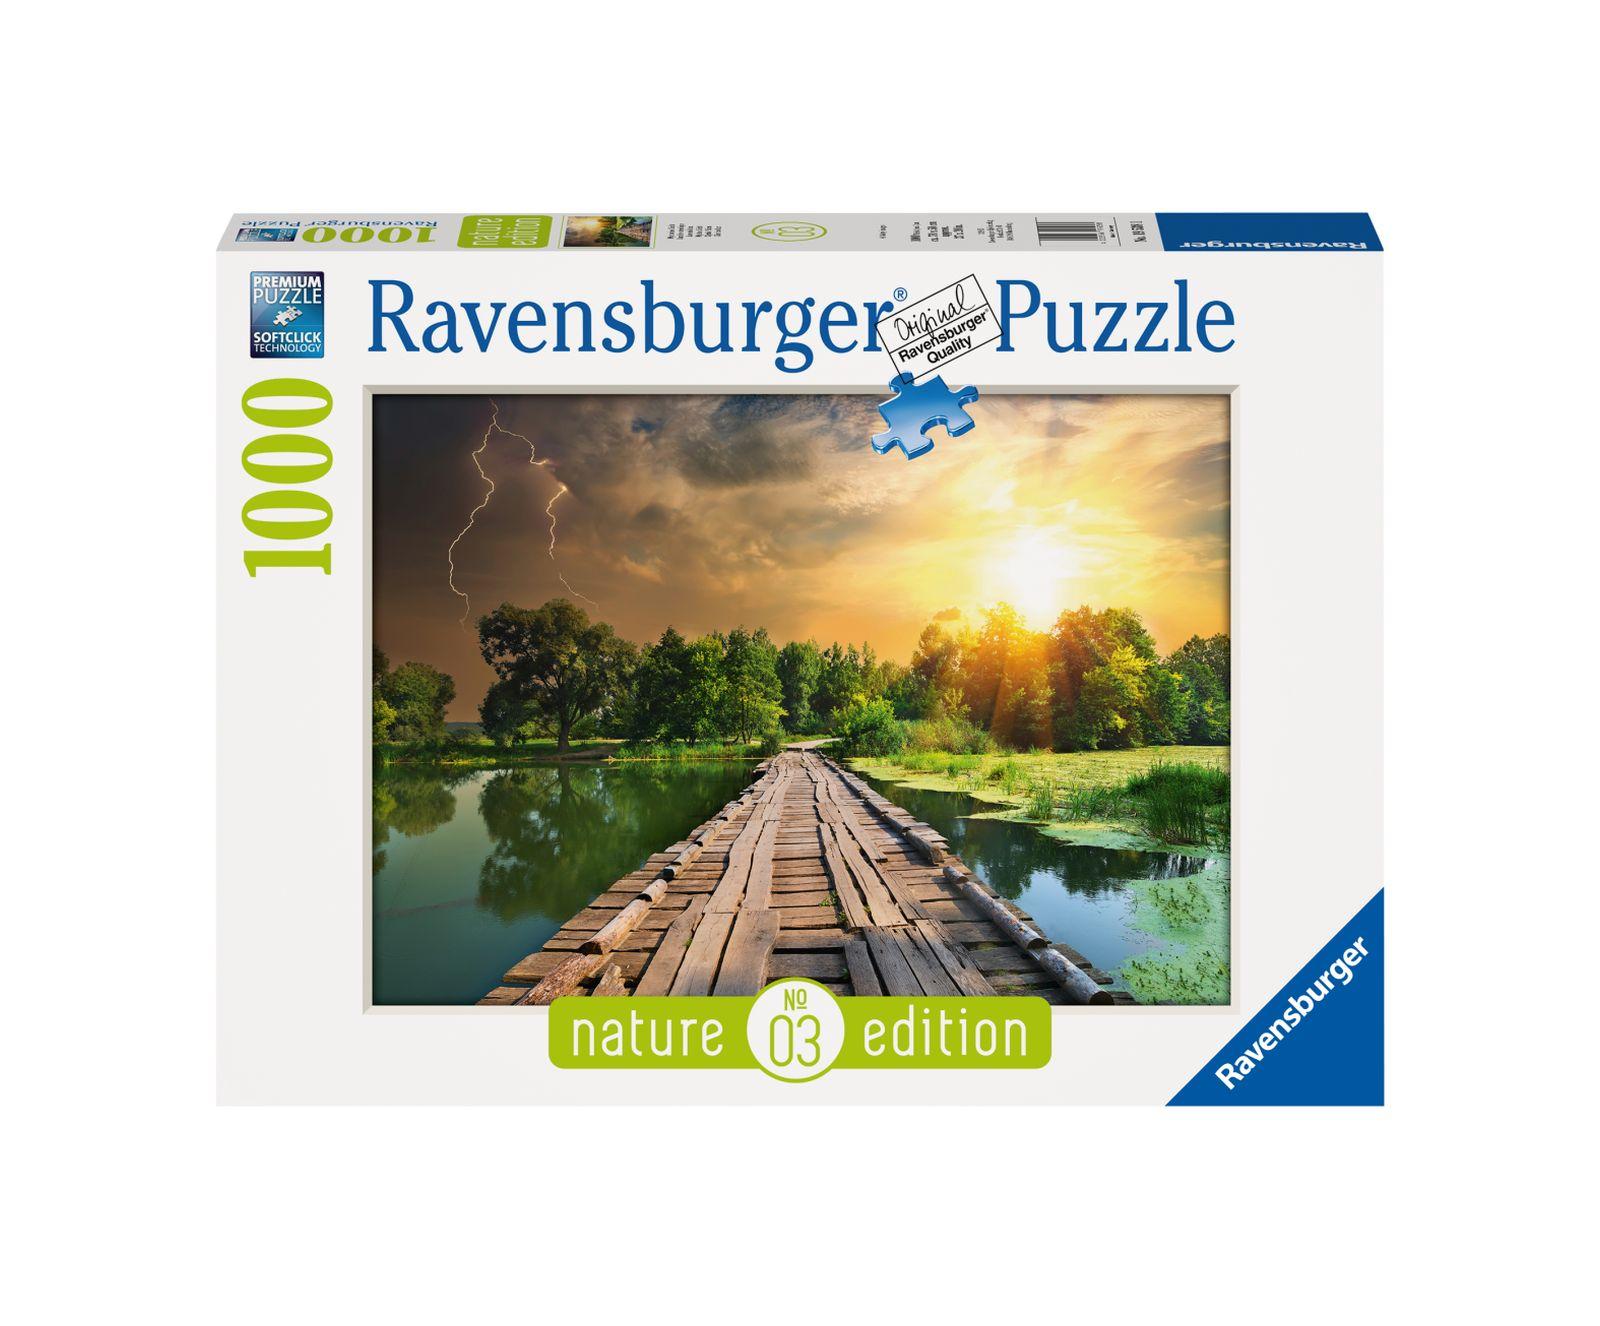 Ravensburger puzzle 1000 pezzi luce mistica - Ravensburger1